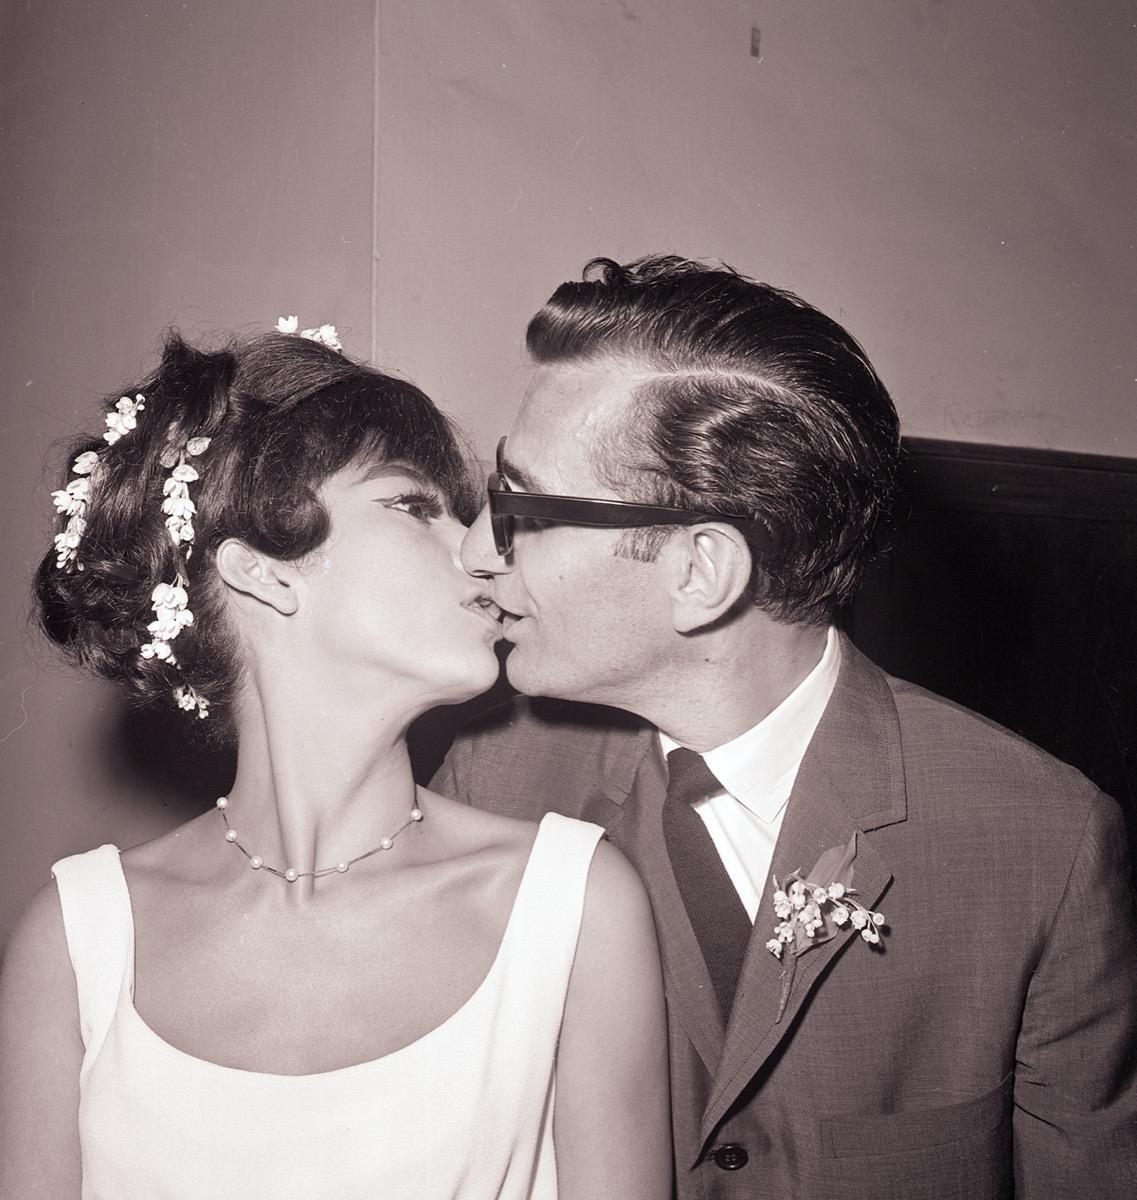 Rita Moreno and Leonard Gordon after their wedding